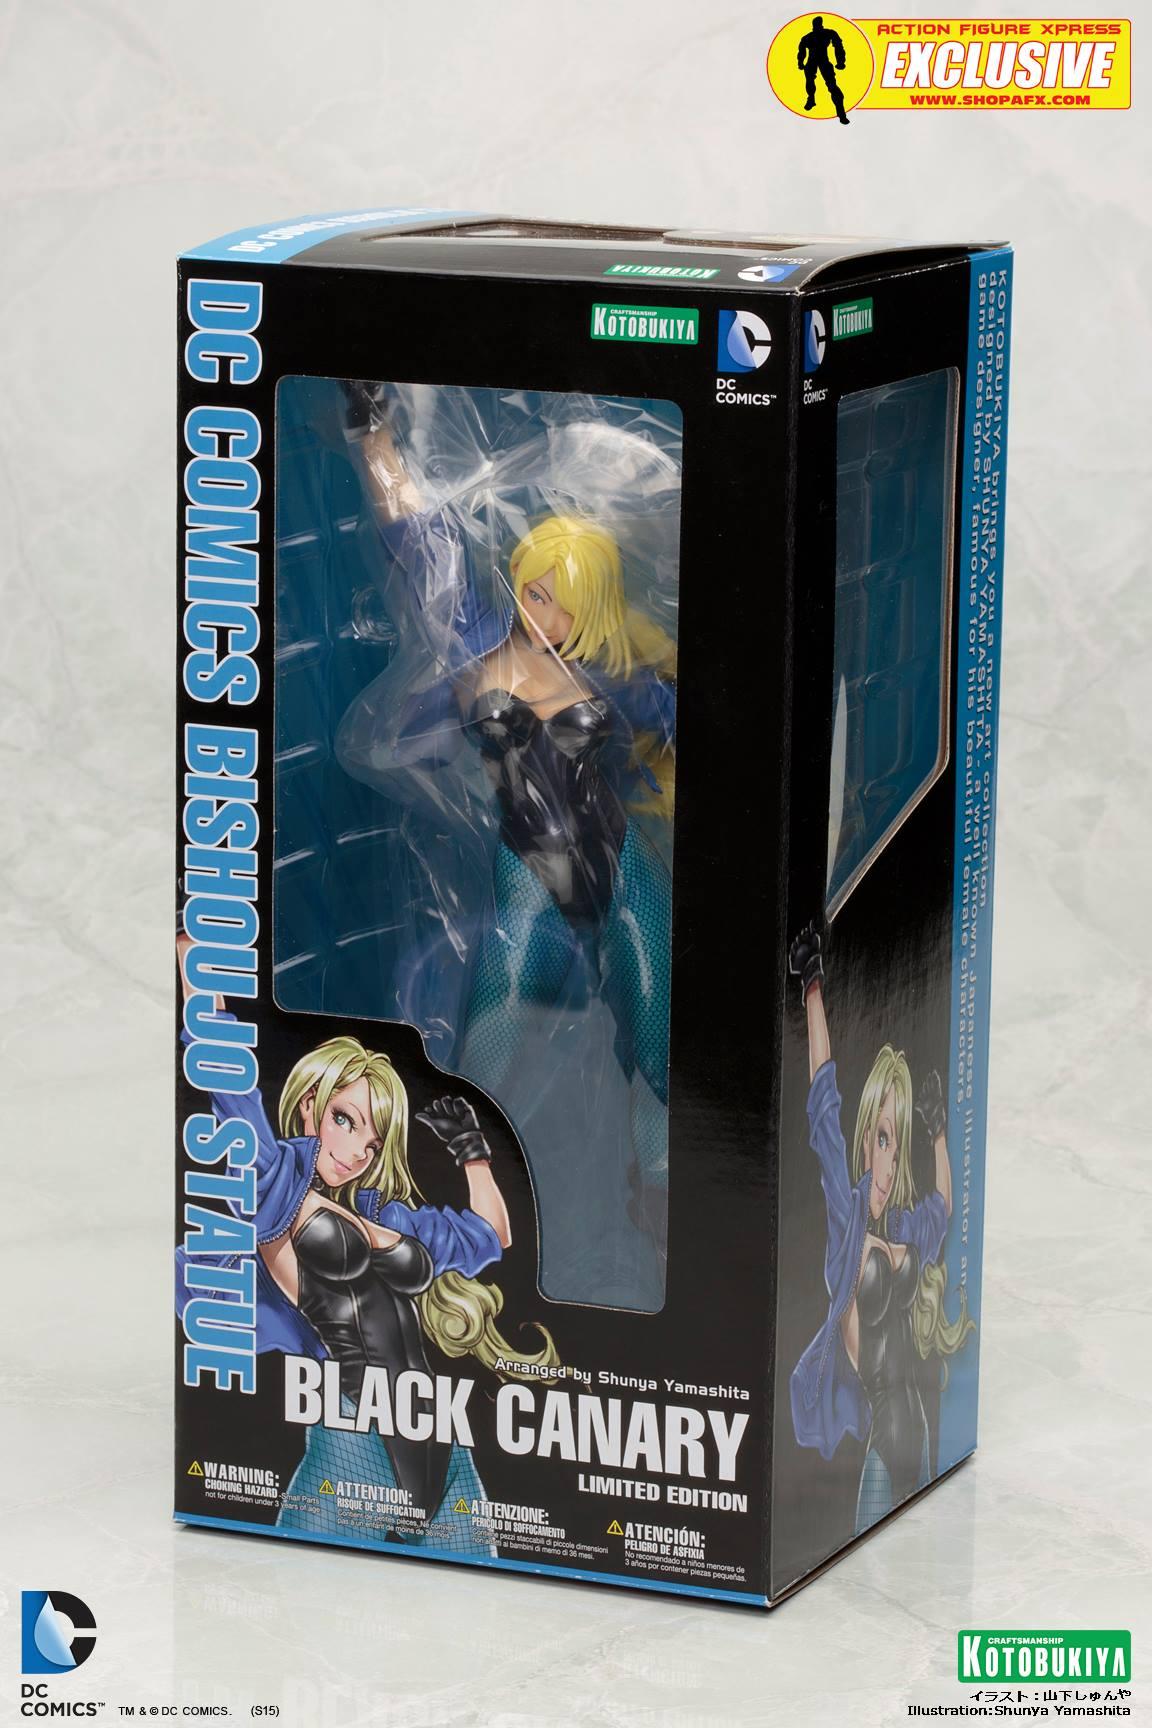 black-canary-classic-costume-bishoujo-statue-exclusive-dc-comics-kotobukiya-5